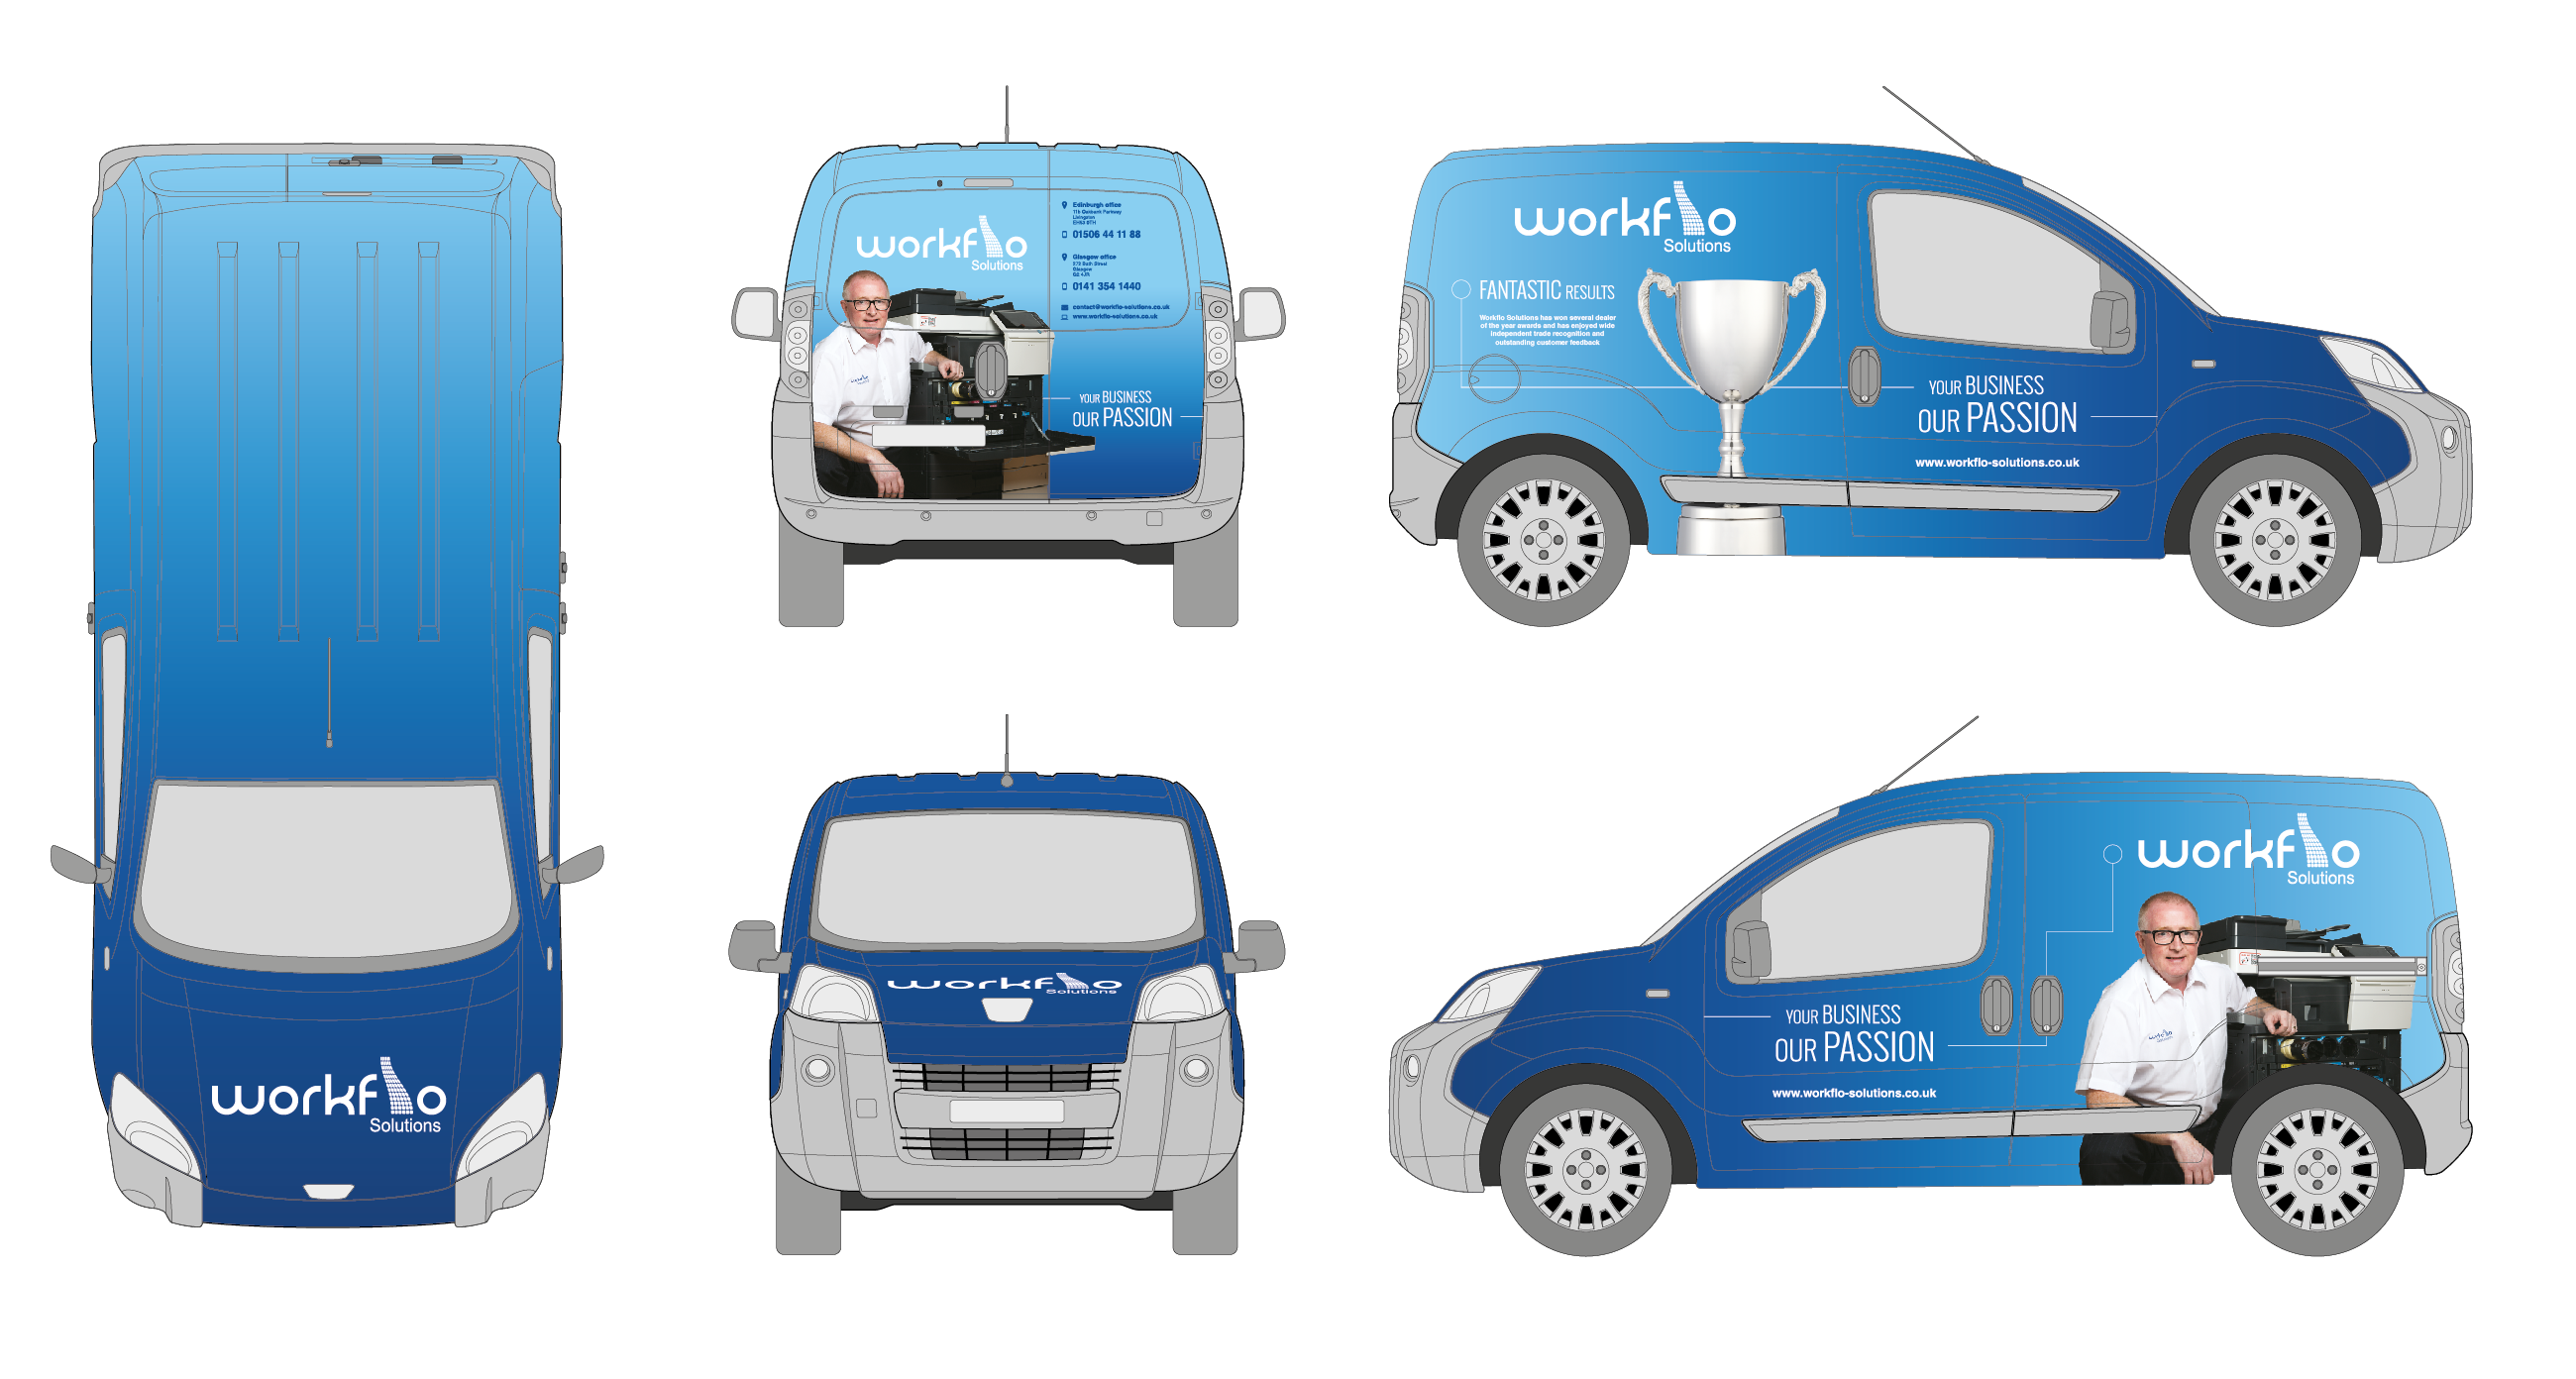 WorkFlo Vehicle Design